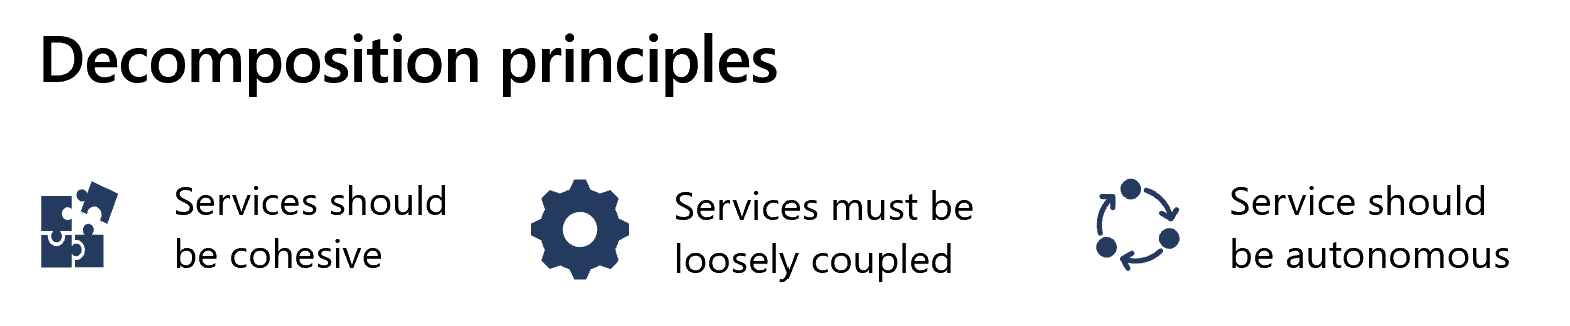 Decomposition Principles